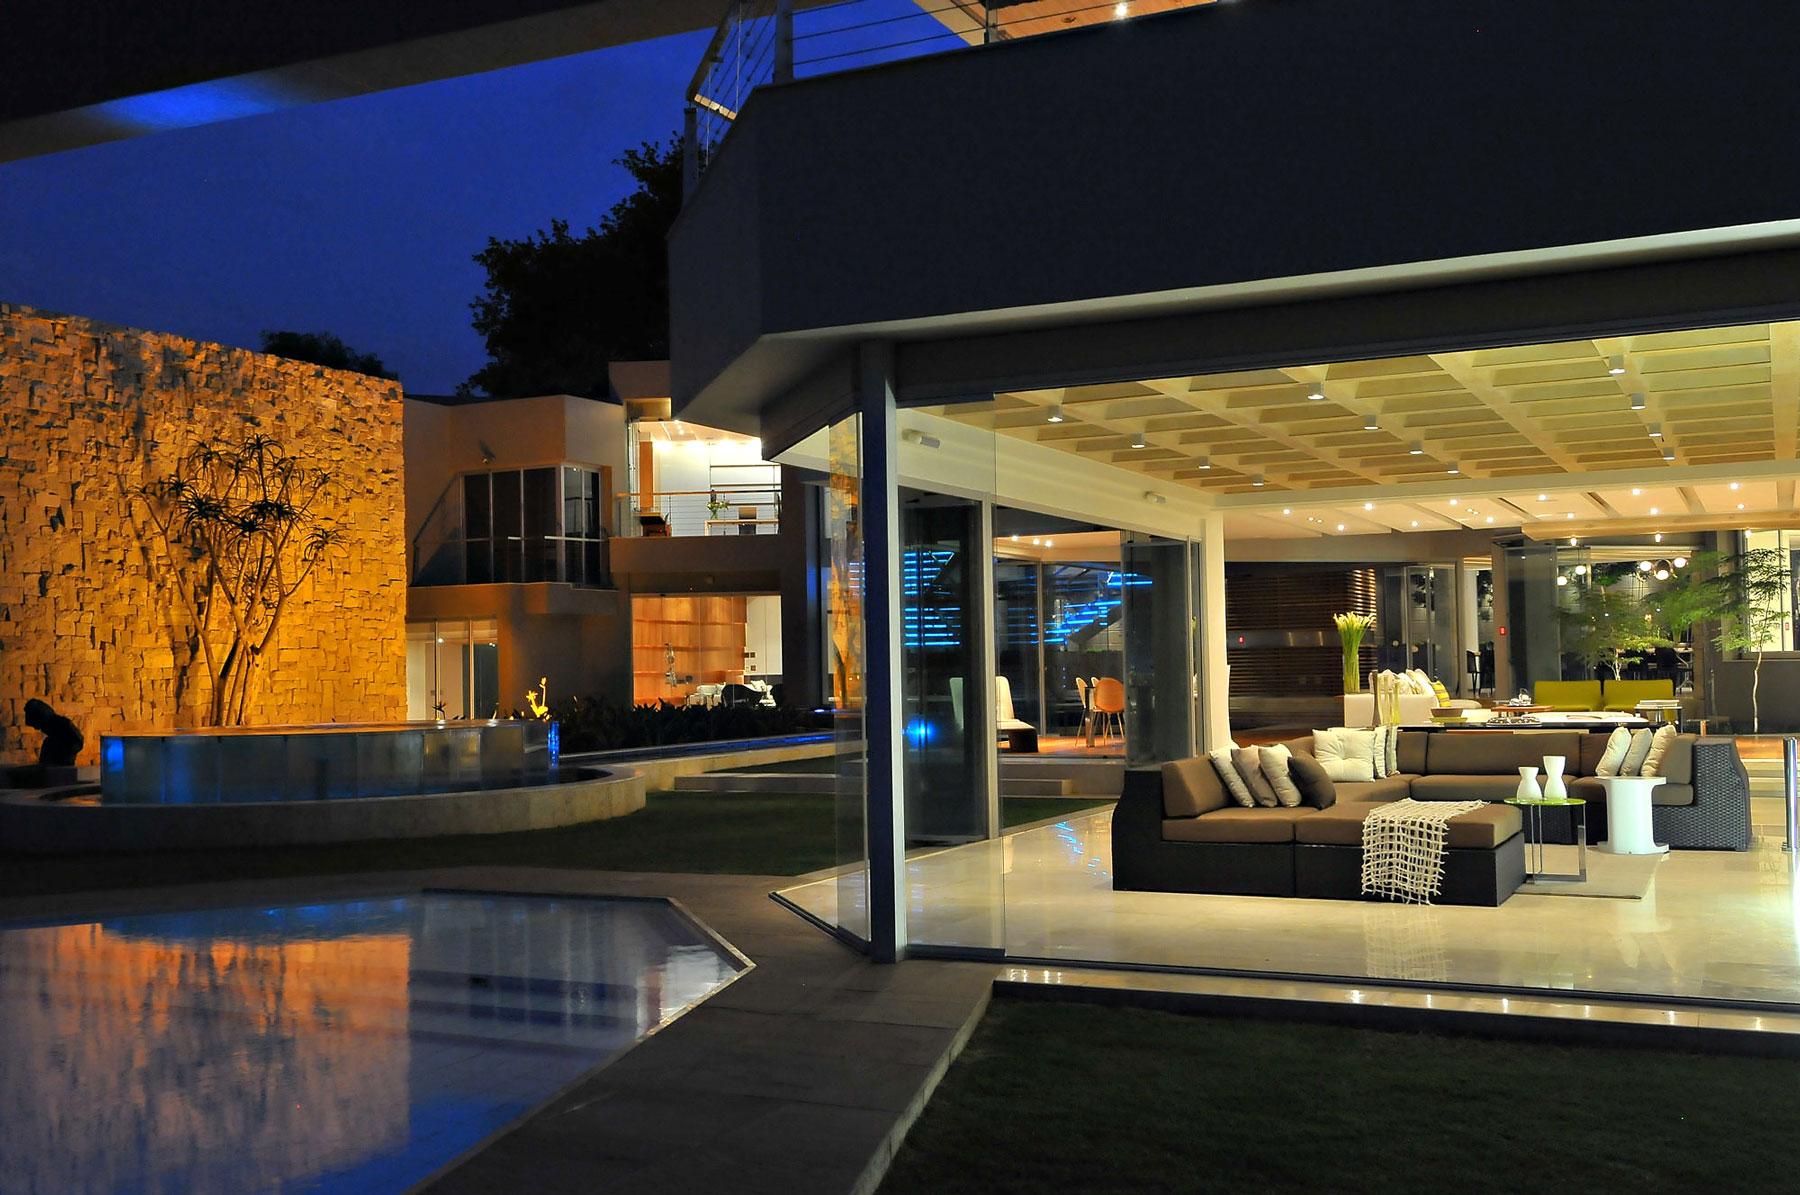 Glass House By Nico Van Der Meulen Architects on Modern Luxury House In Johannesburg